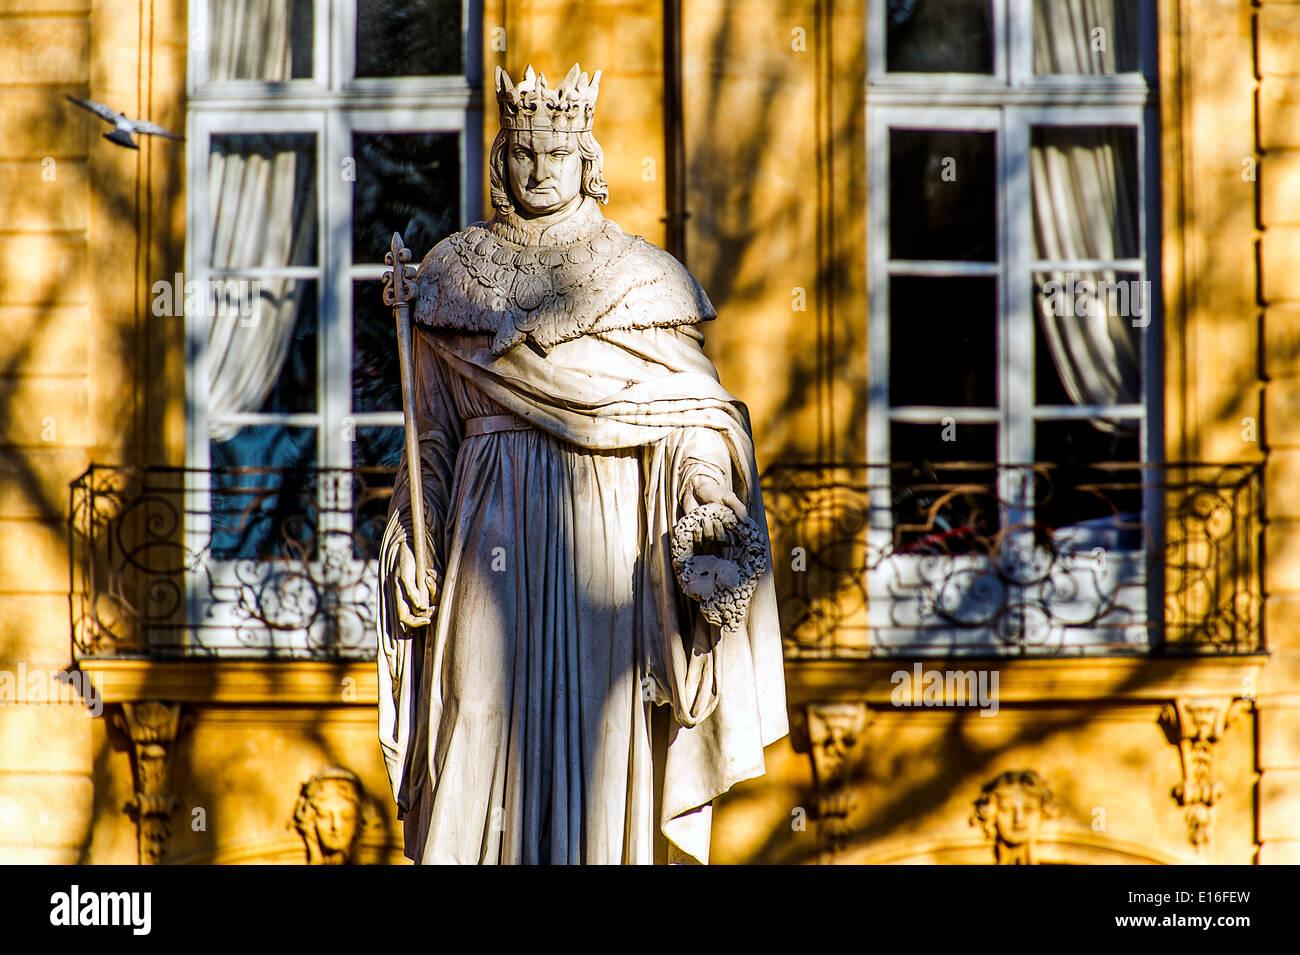 Europe, France, Bouches-du-Rhone, Aix-en-Provence. Cours Mirabeau, Statue of Roi Rene. - Stock Image